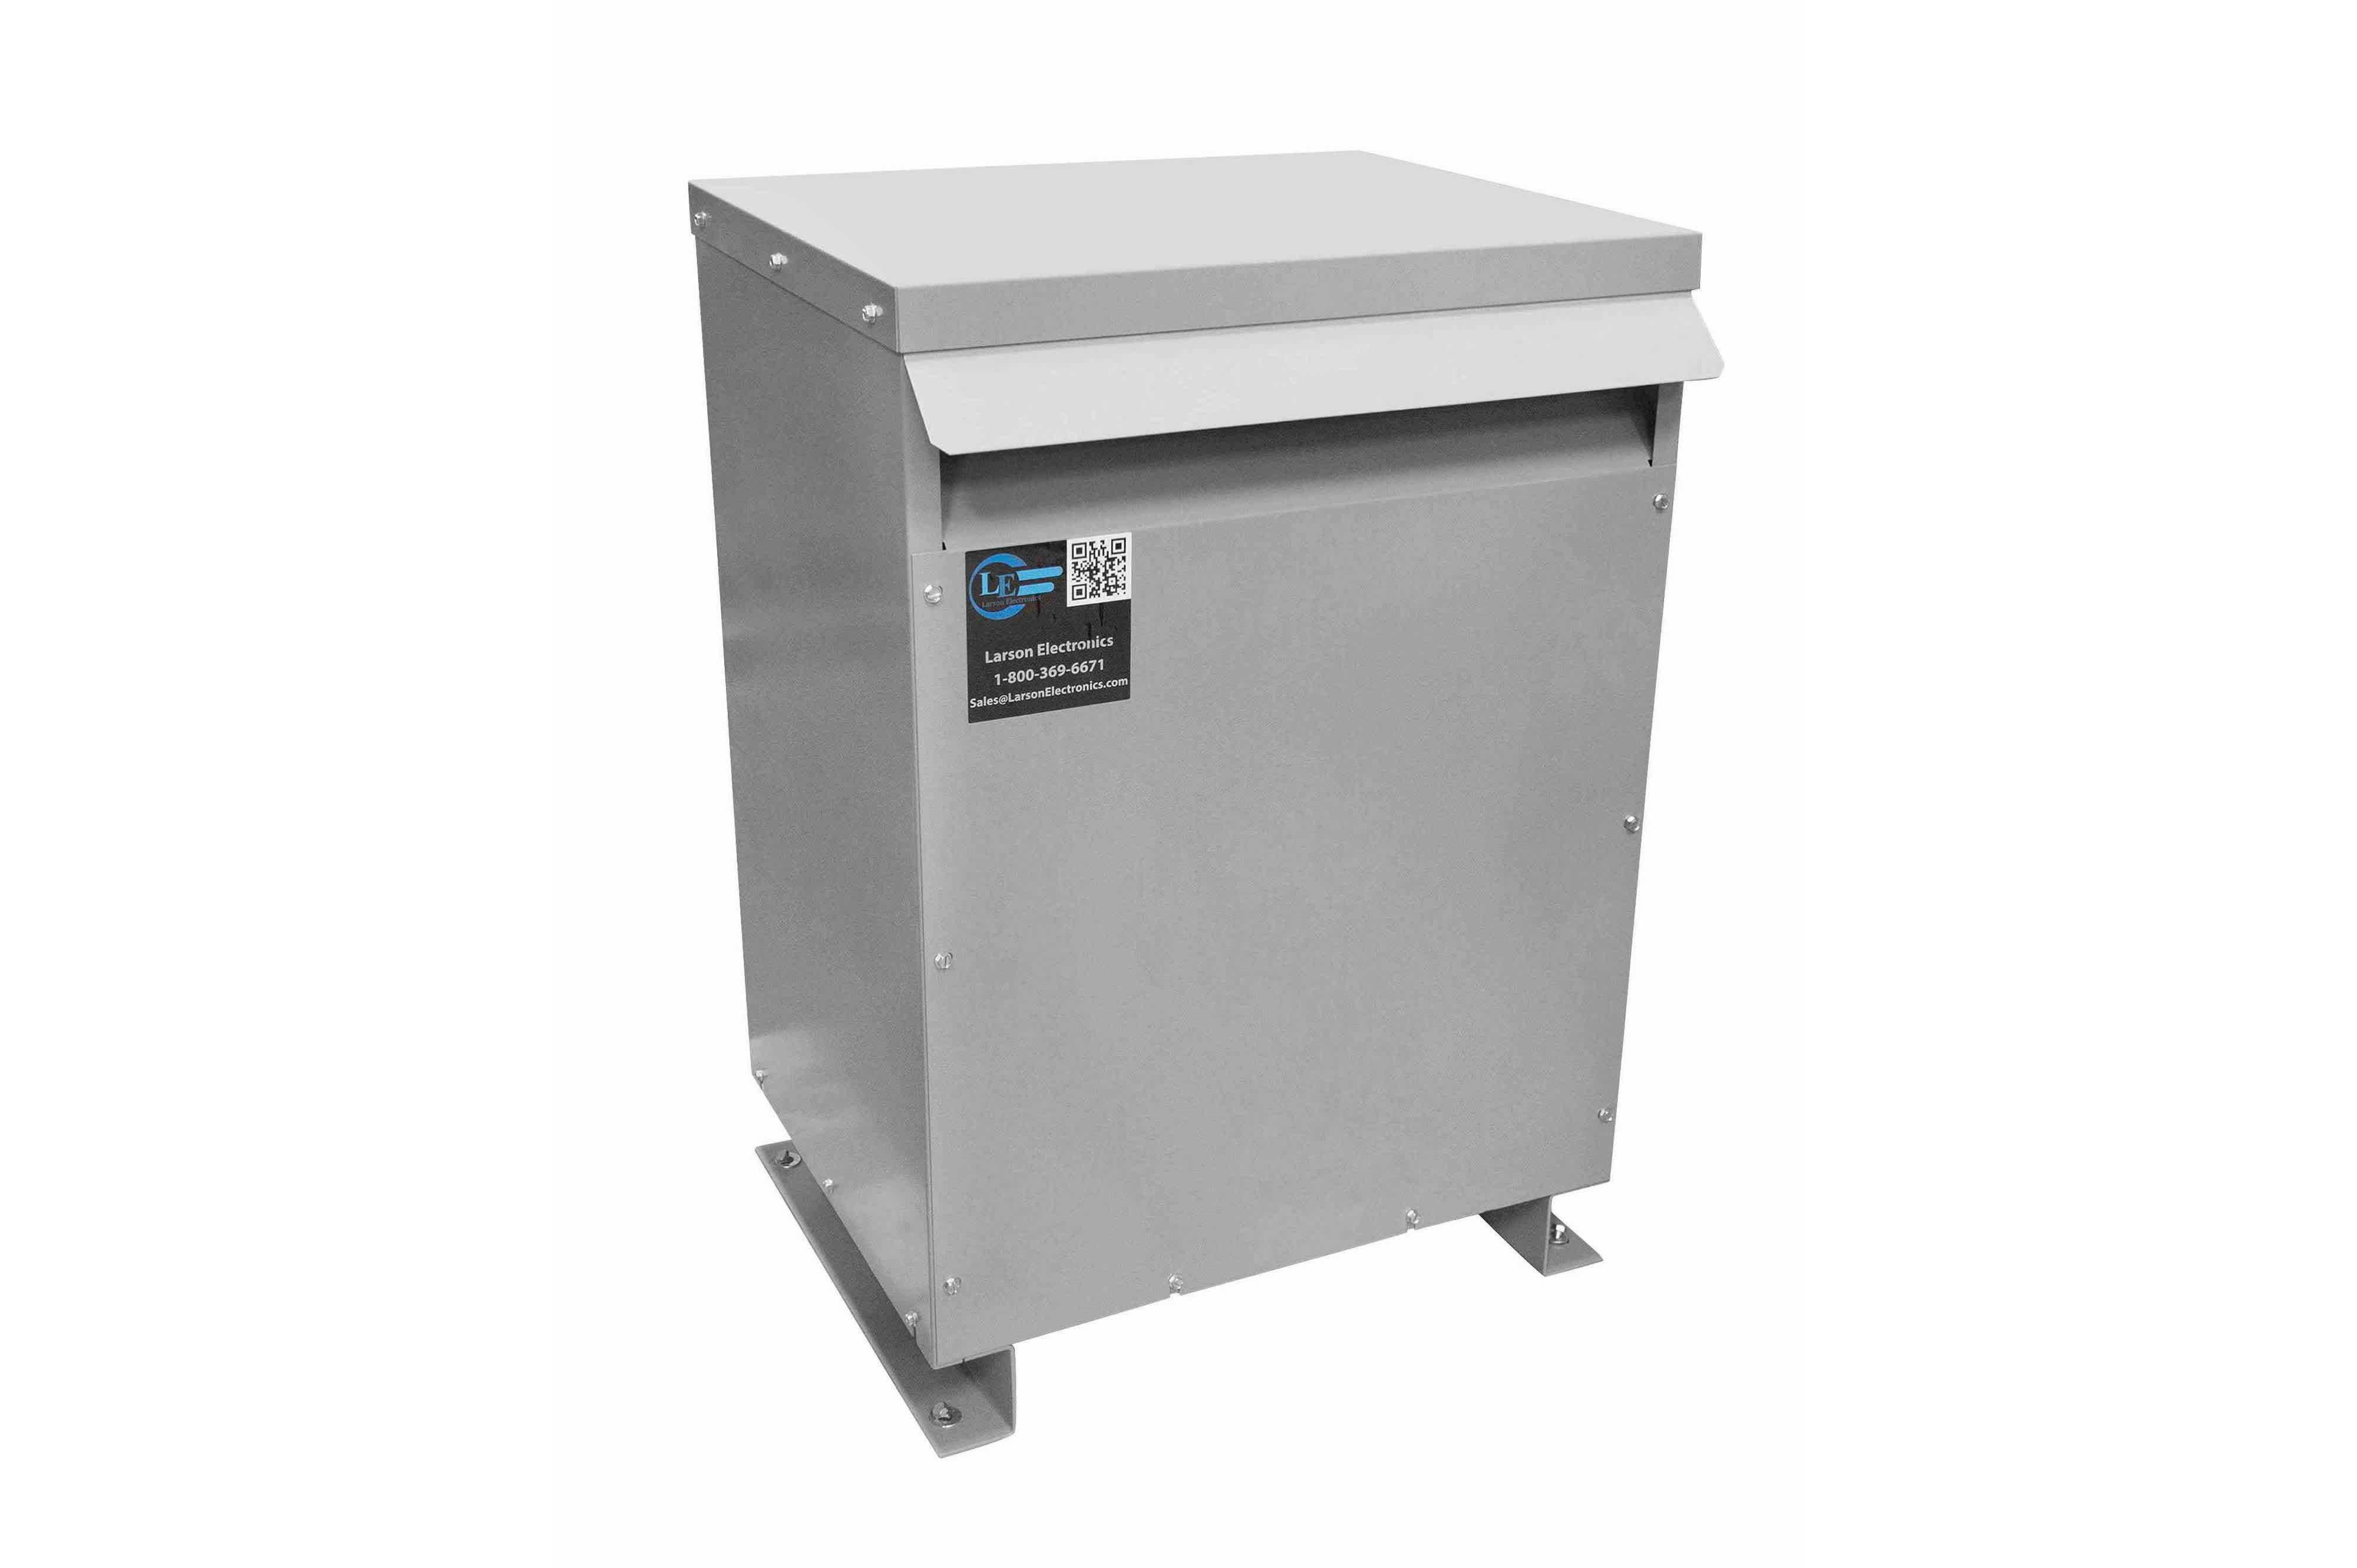 400 kVA 3PH Isolation Transformer, 208V Wye Primary, 380V Delta Secondary, N3R, Ventilated, 60 Hz